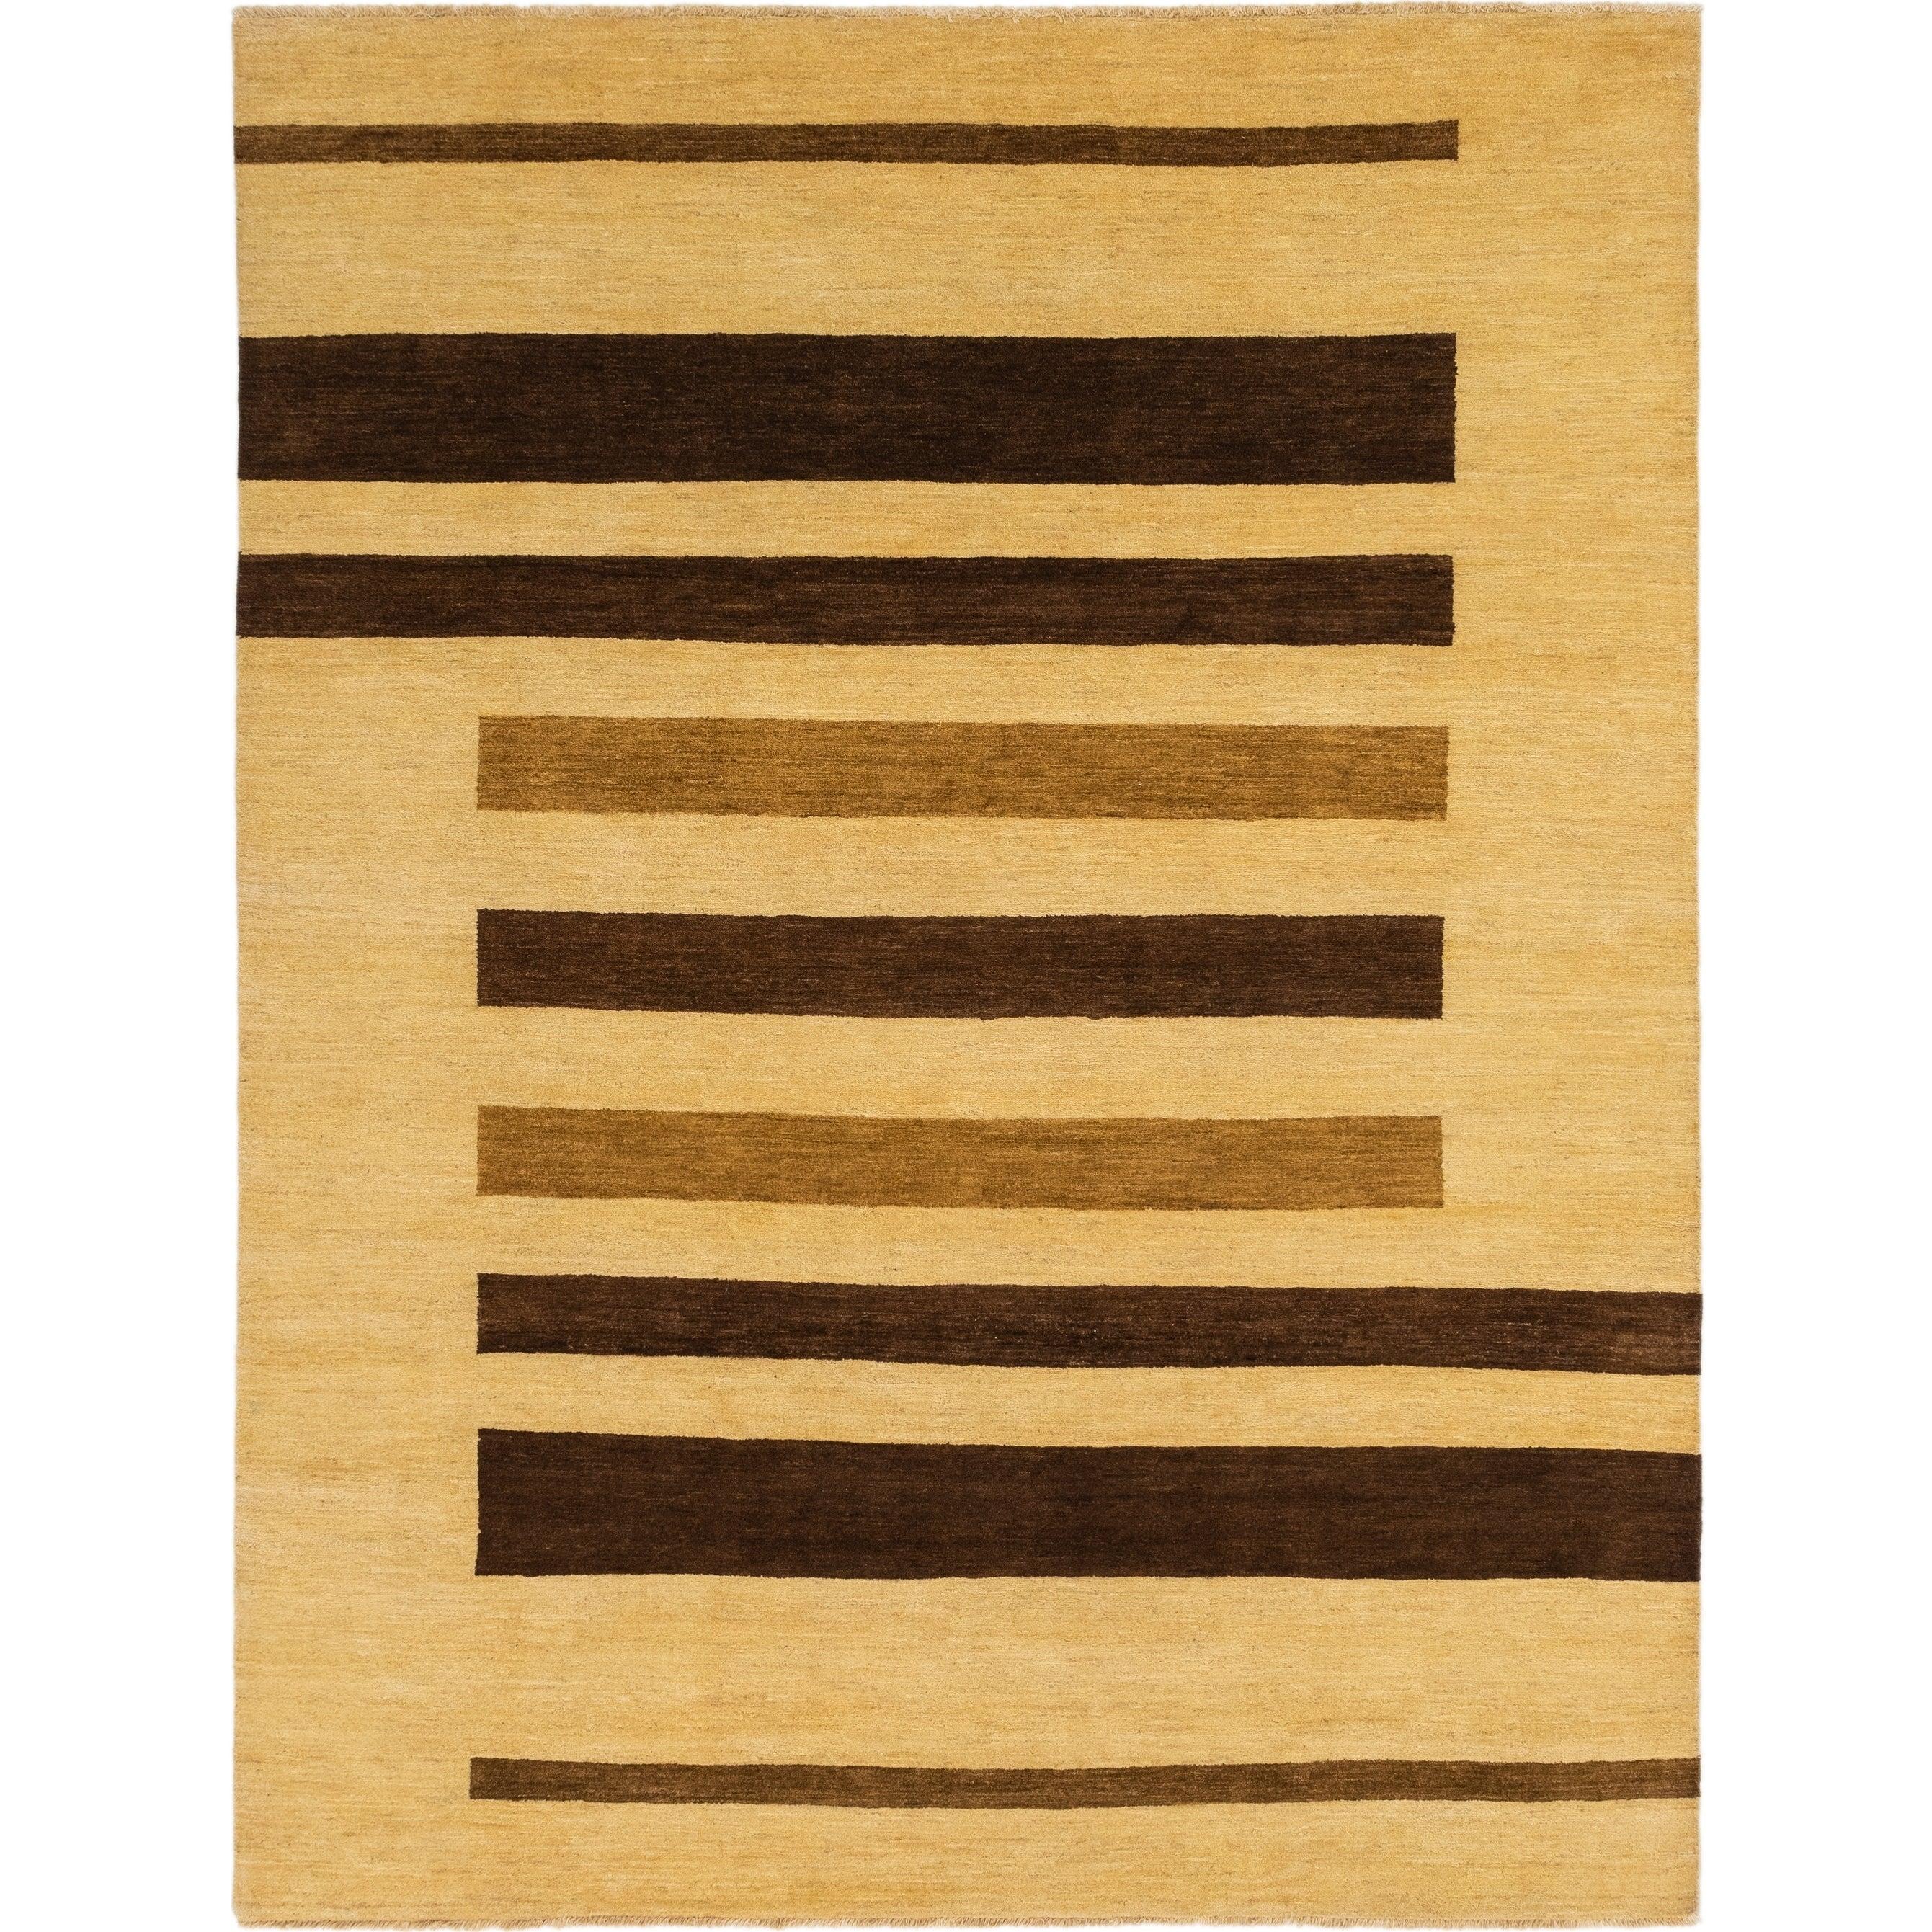 Hand Knotted Kashkuli Gabbeh Wool Area Rug - 8 2 x 10 7 (Cream - 8 2 x 10 7)